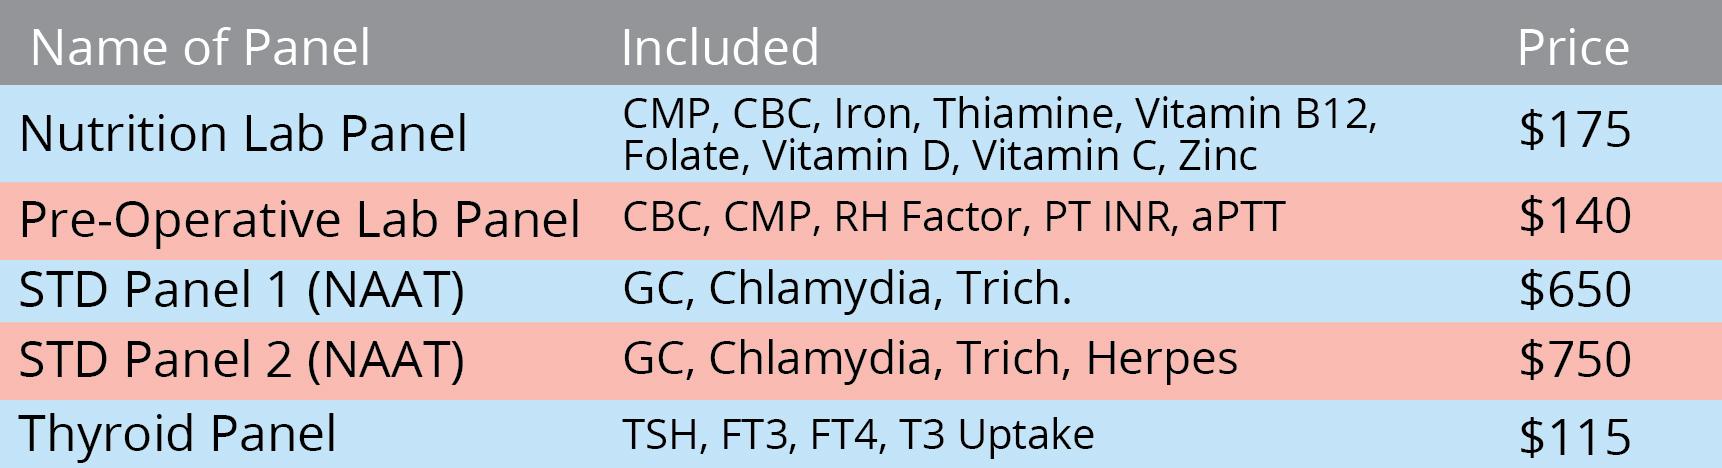 Cash List_Final_panel